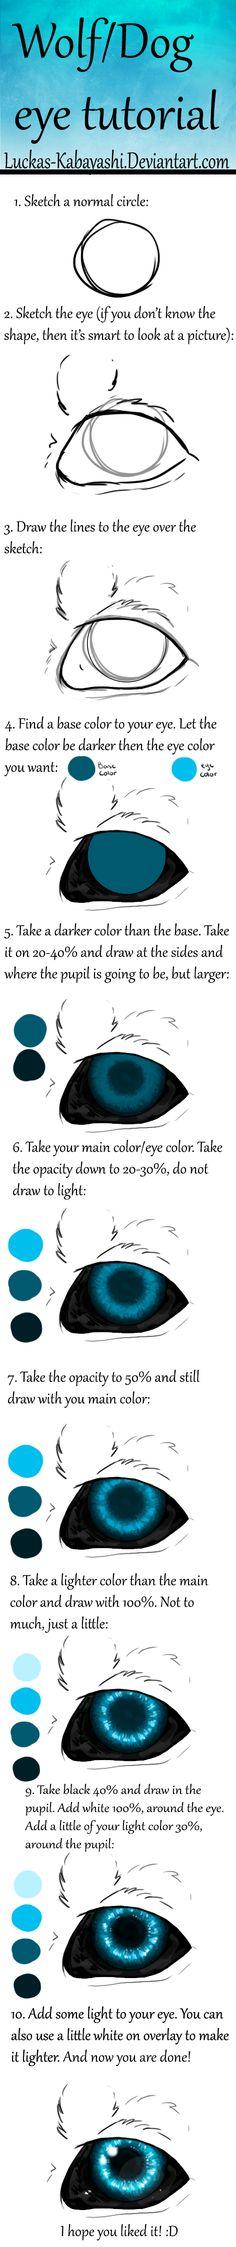 wolf_dog_eye_tutorial_by_luckas_kabayashi-d8r5xrv.png 472 × 4495 bildepunkter